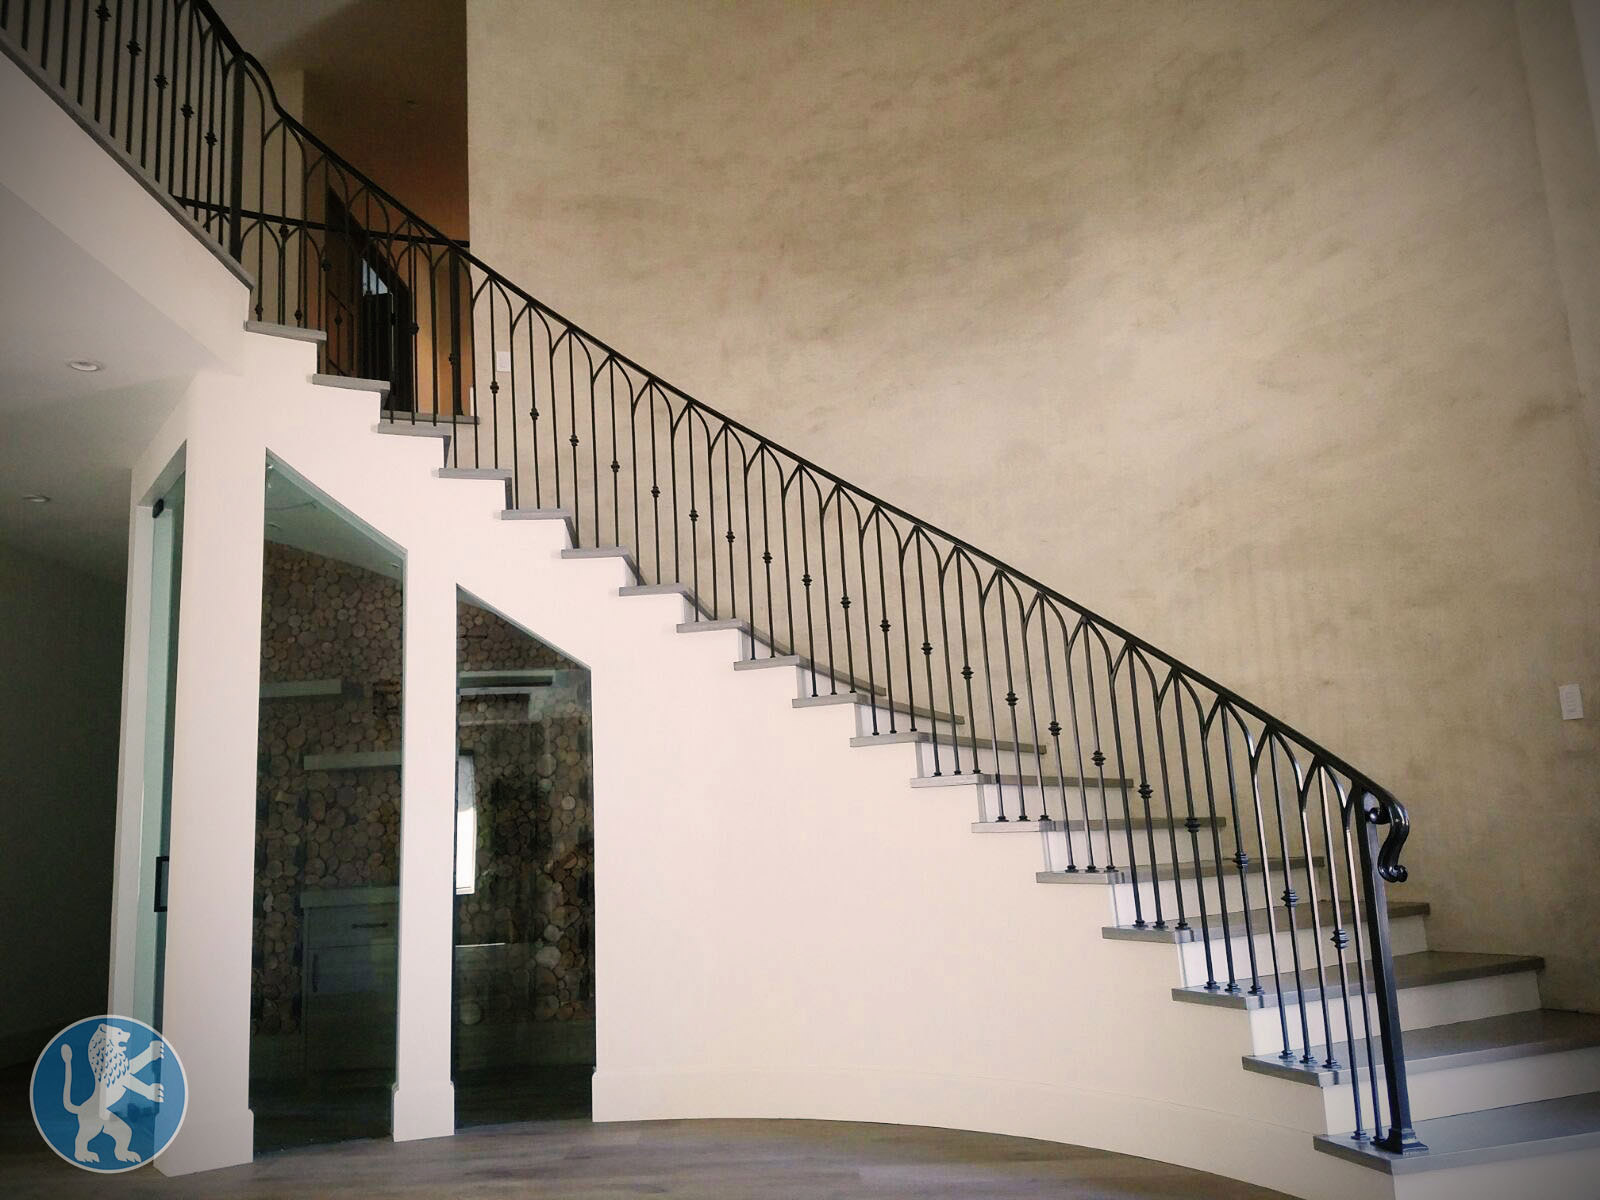 decorative railings. Decorative railings with ornamental design and decorative knuckles  Railings Perfect Garage Doors Gates Inc